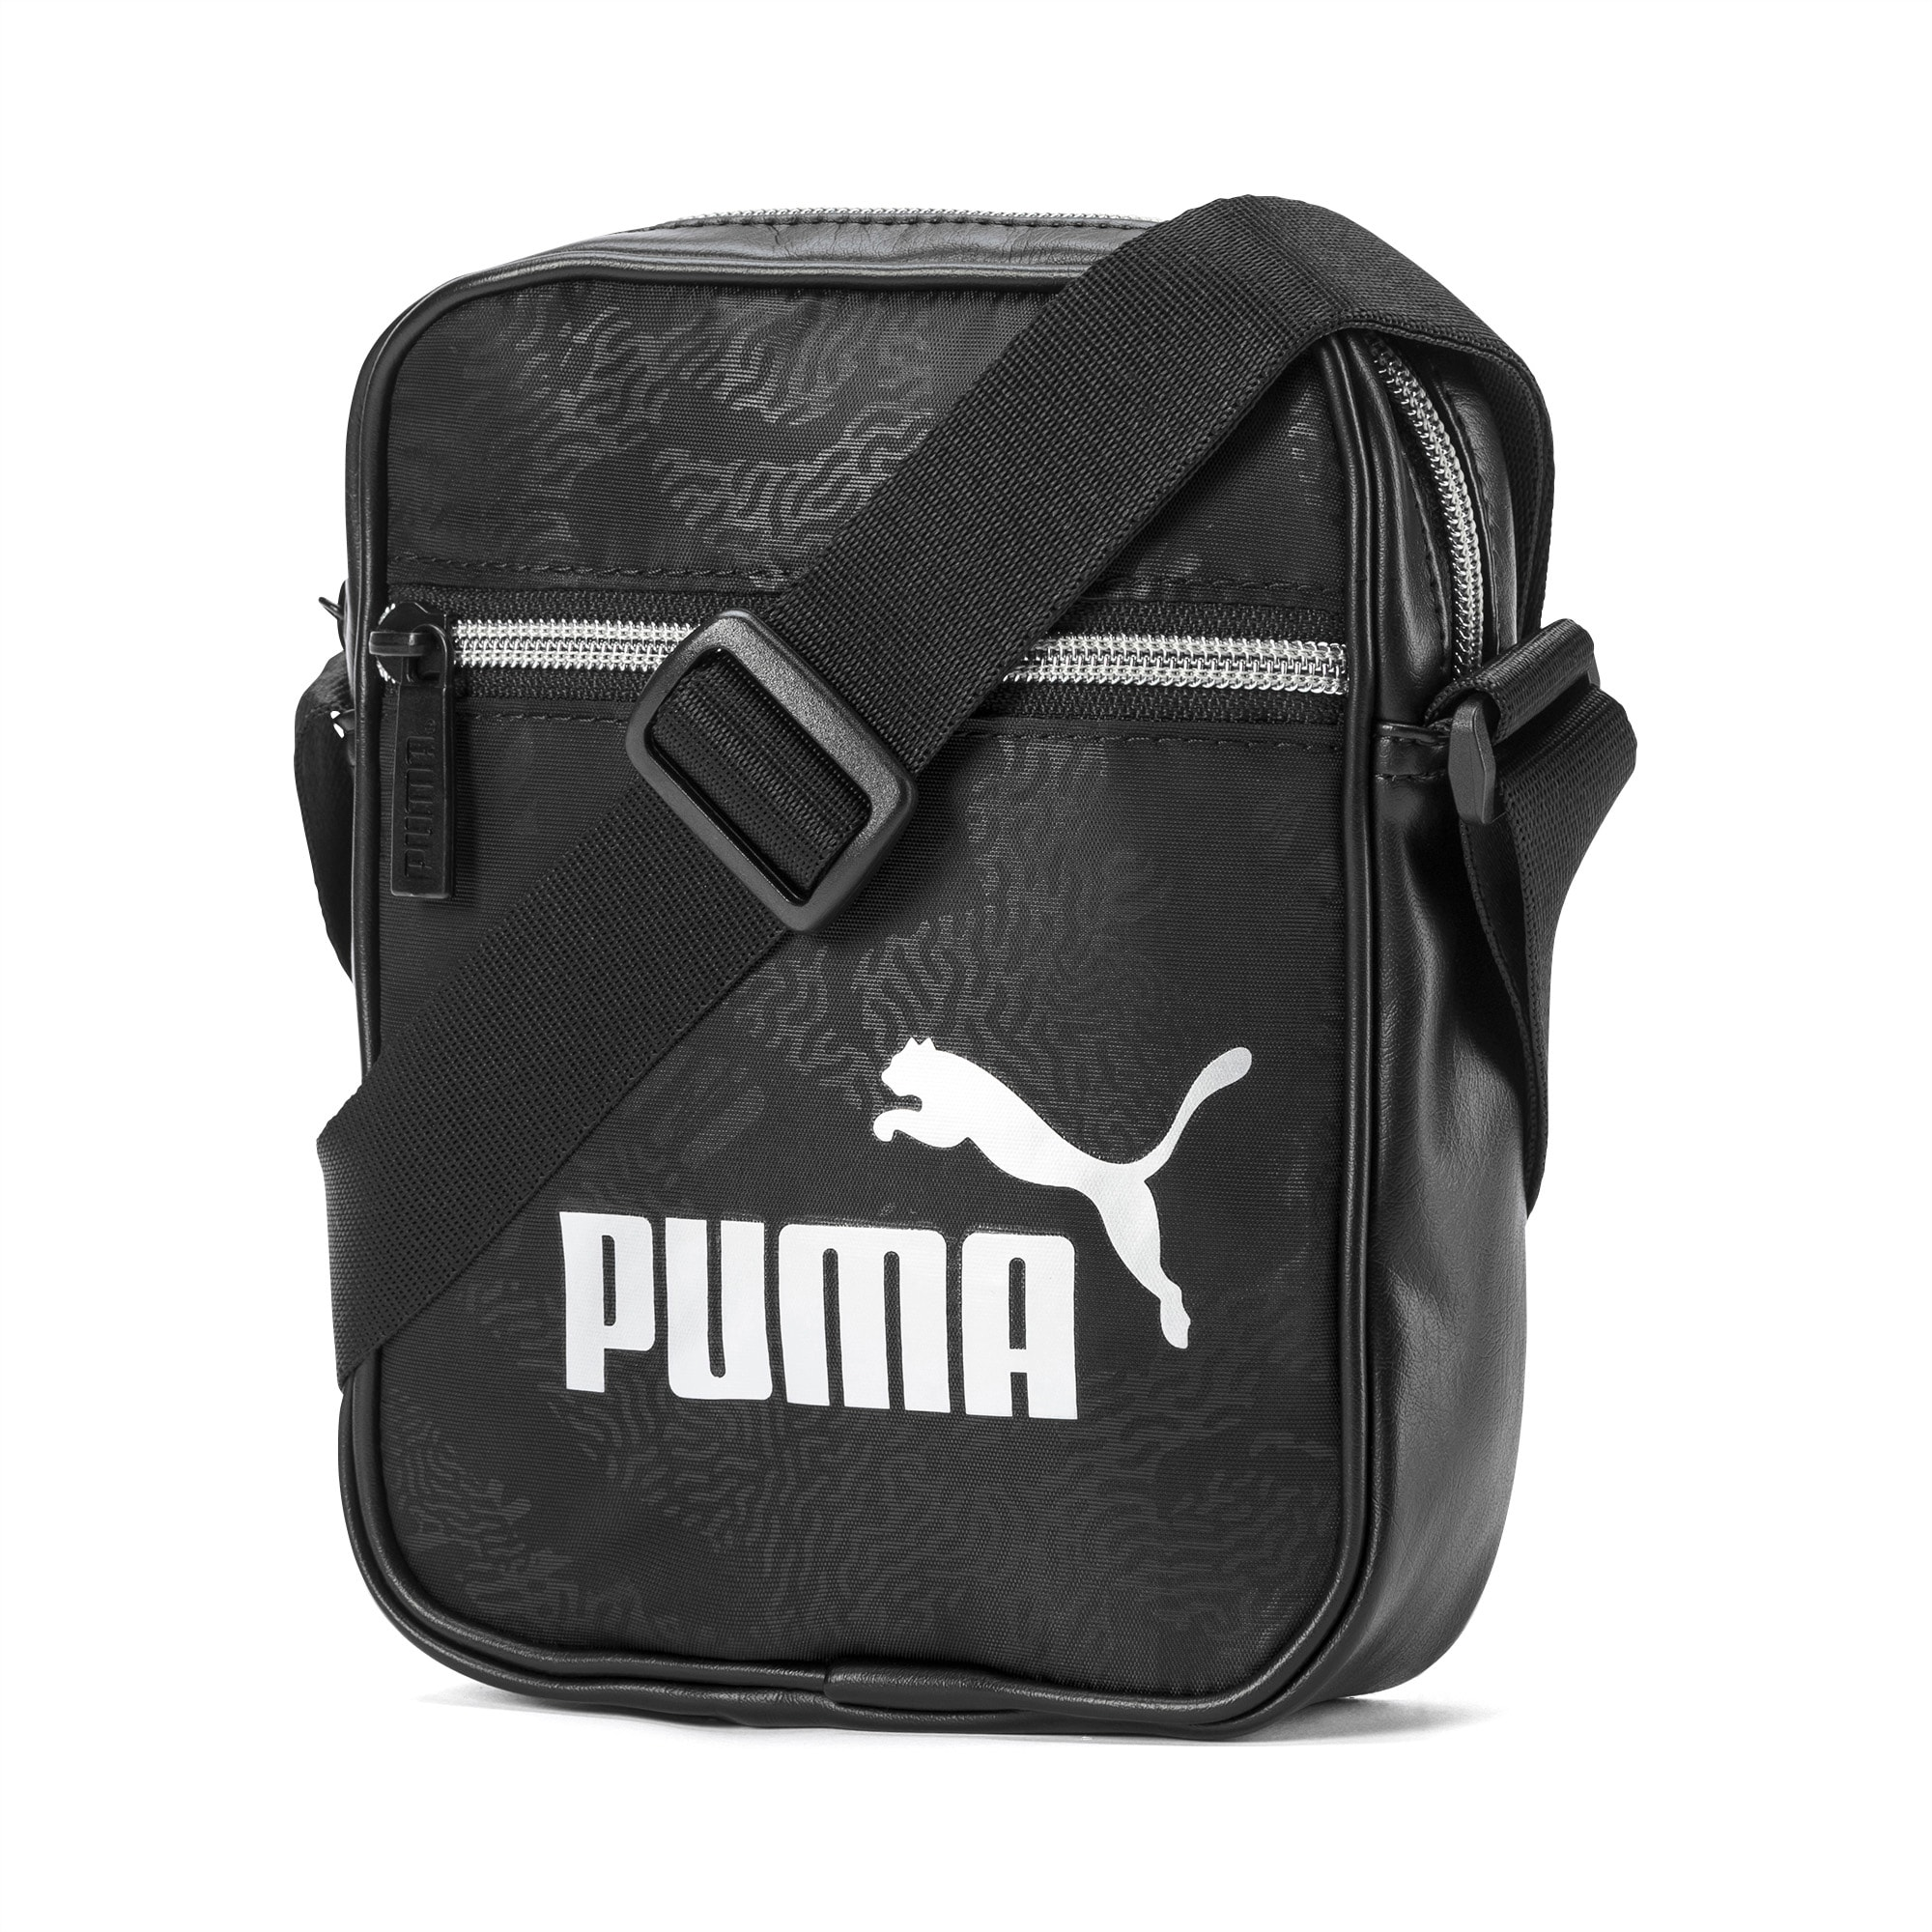 Portable Women's Shoulder Bag | Puma Black | PUMA Gifts under RM150 | PUMA